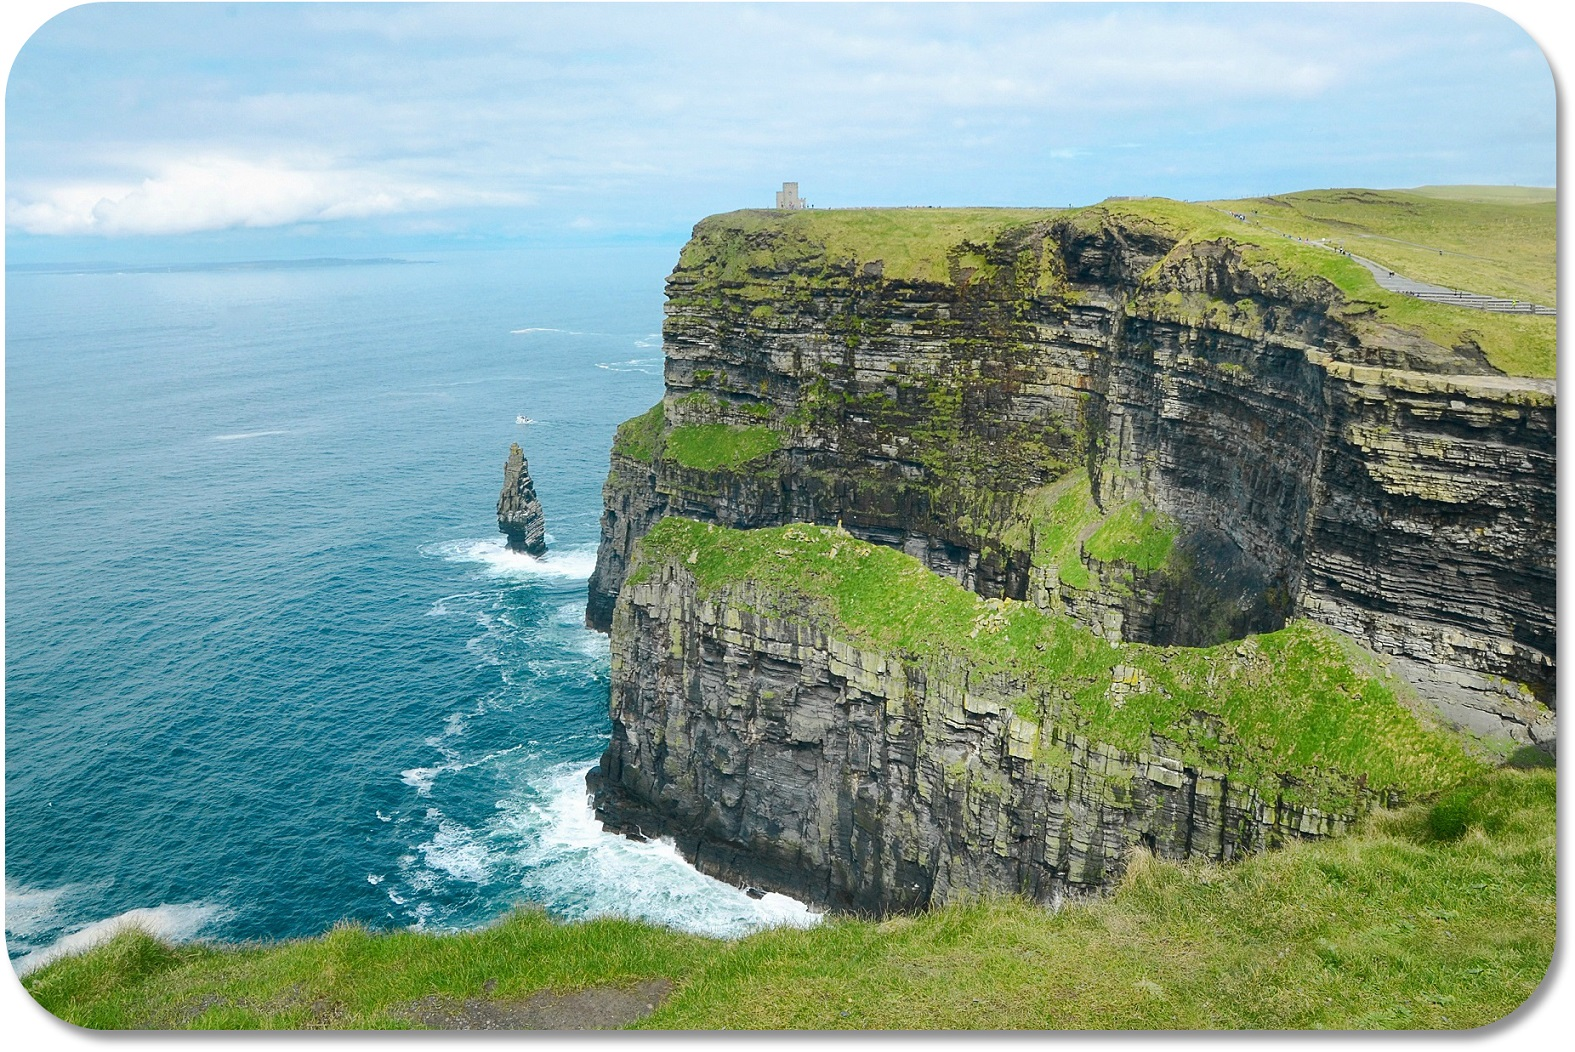 Irish Expressions - Cliffs of Moher.  Photocredit:  Theo Crazzolara via Flickr.